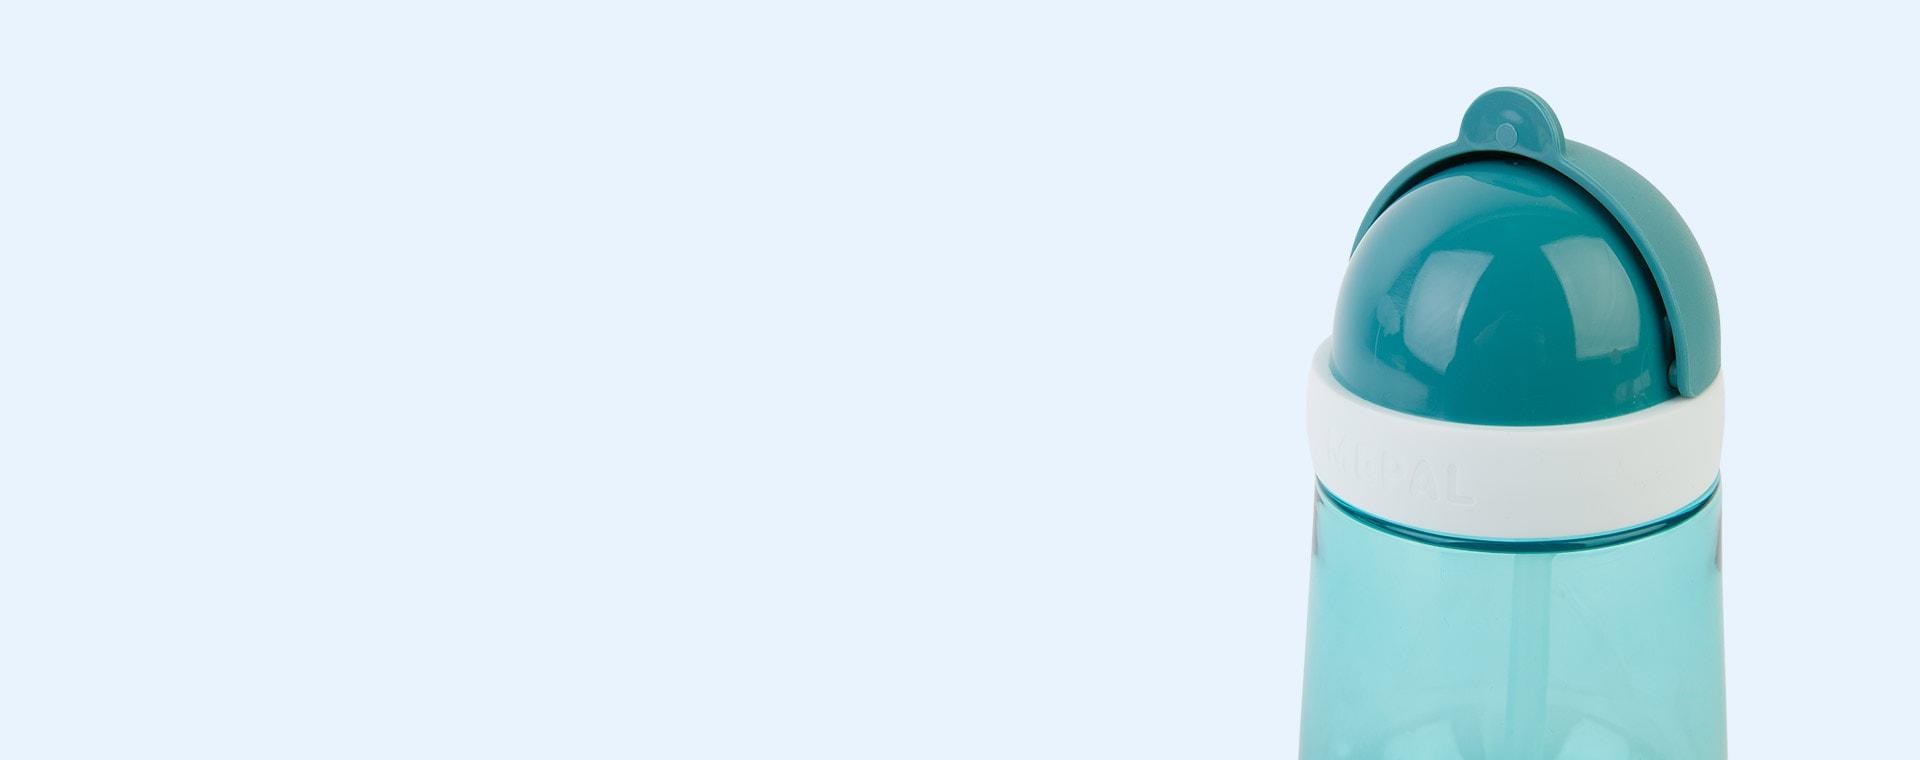 Deep Turquoise Mepal Straw Cup Mio